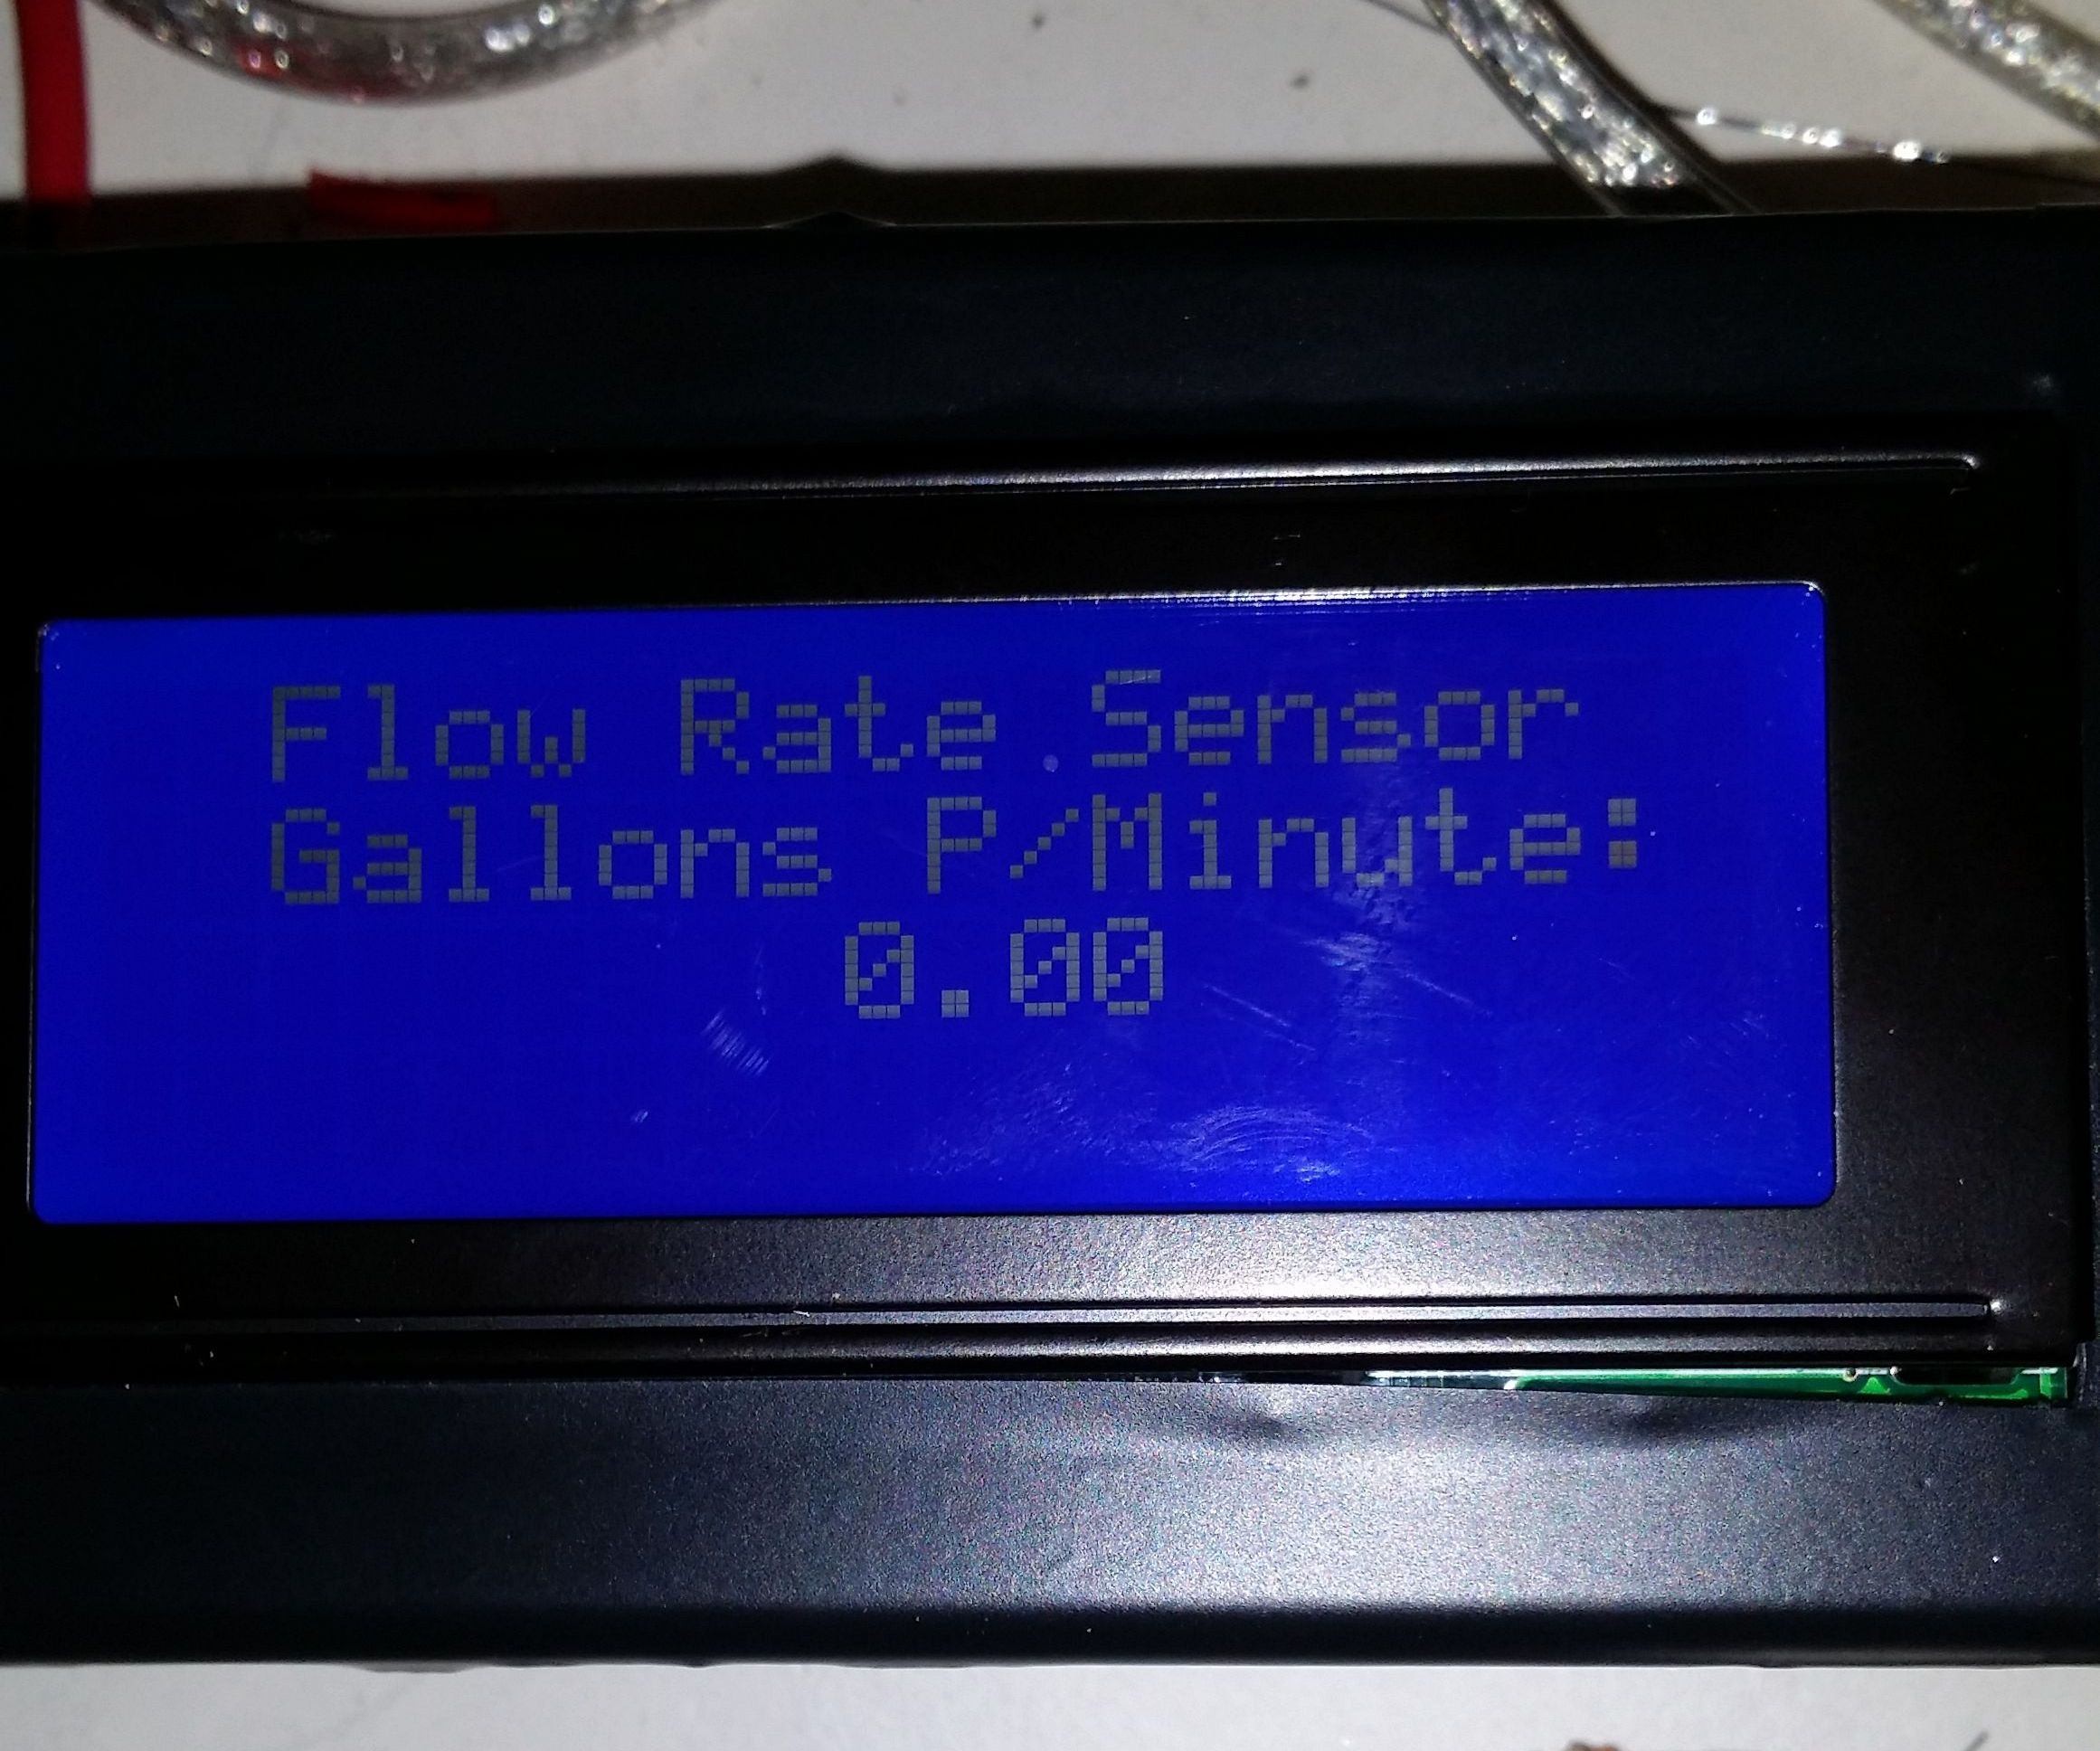 Ultimate Sensor Box W/LCD Display and Web Interface